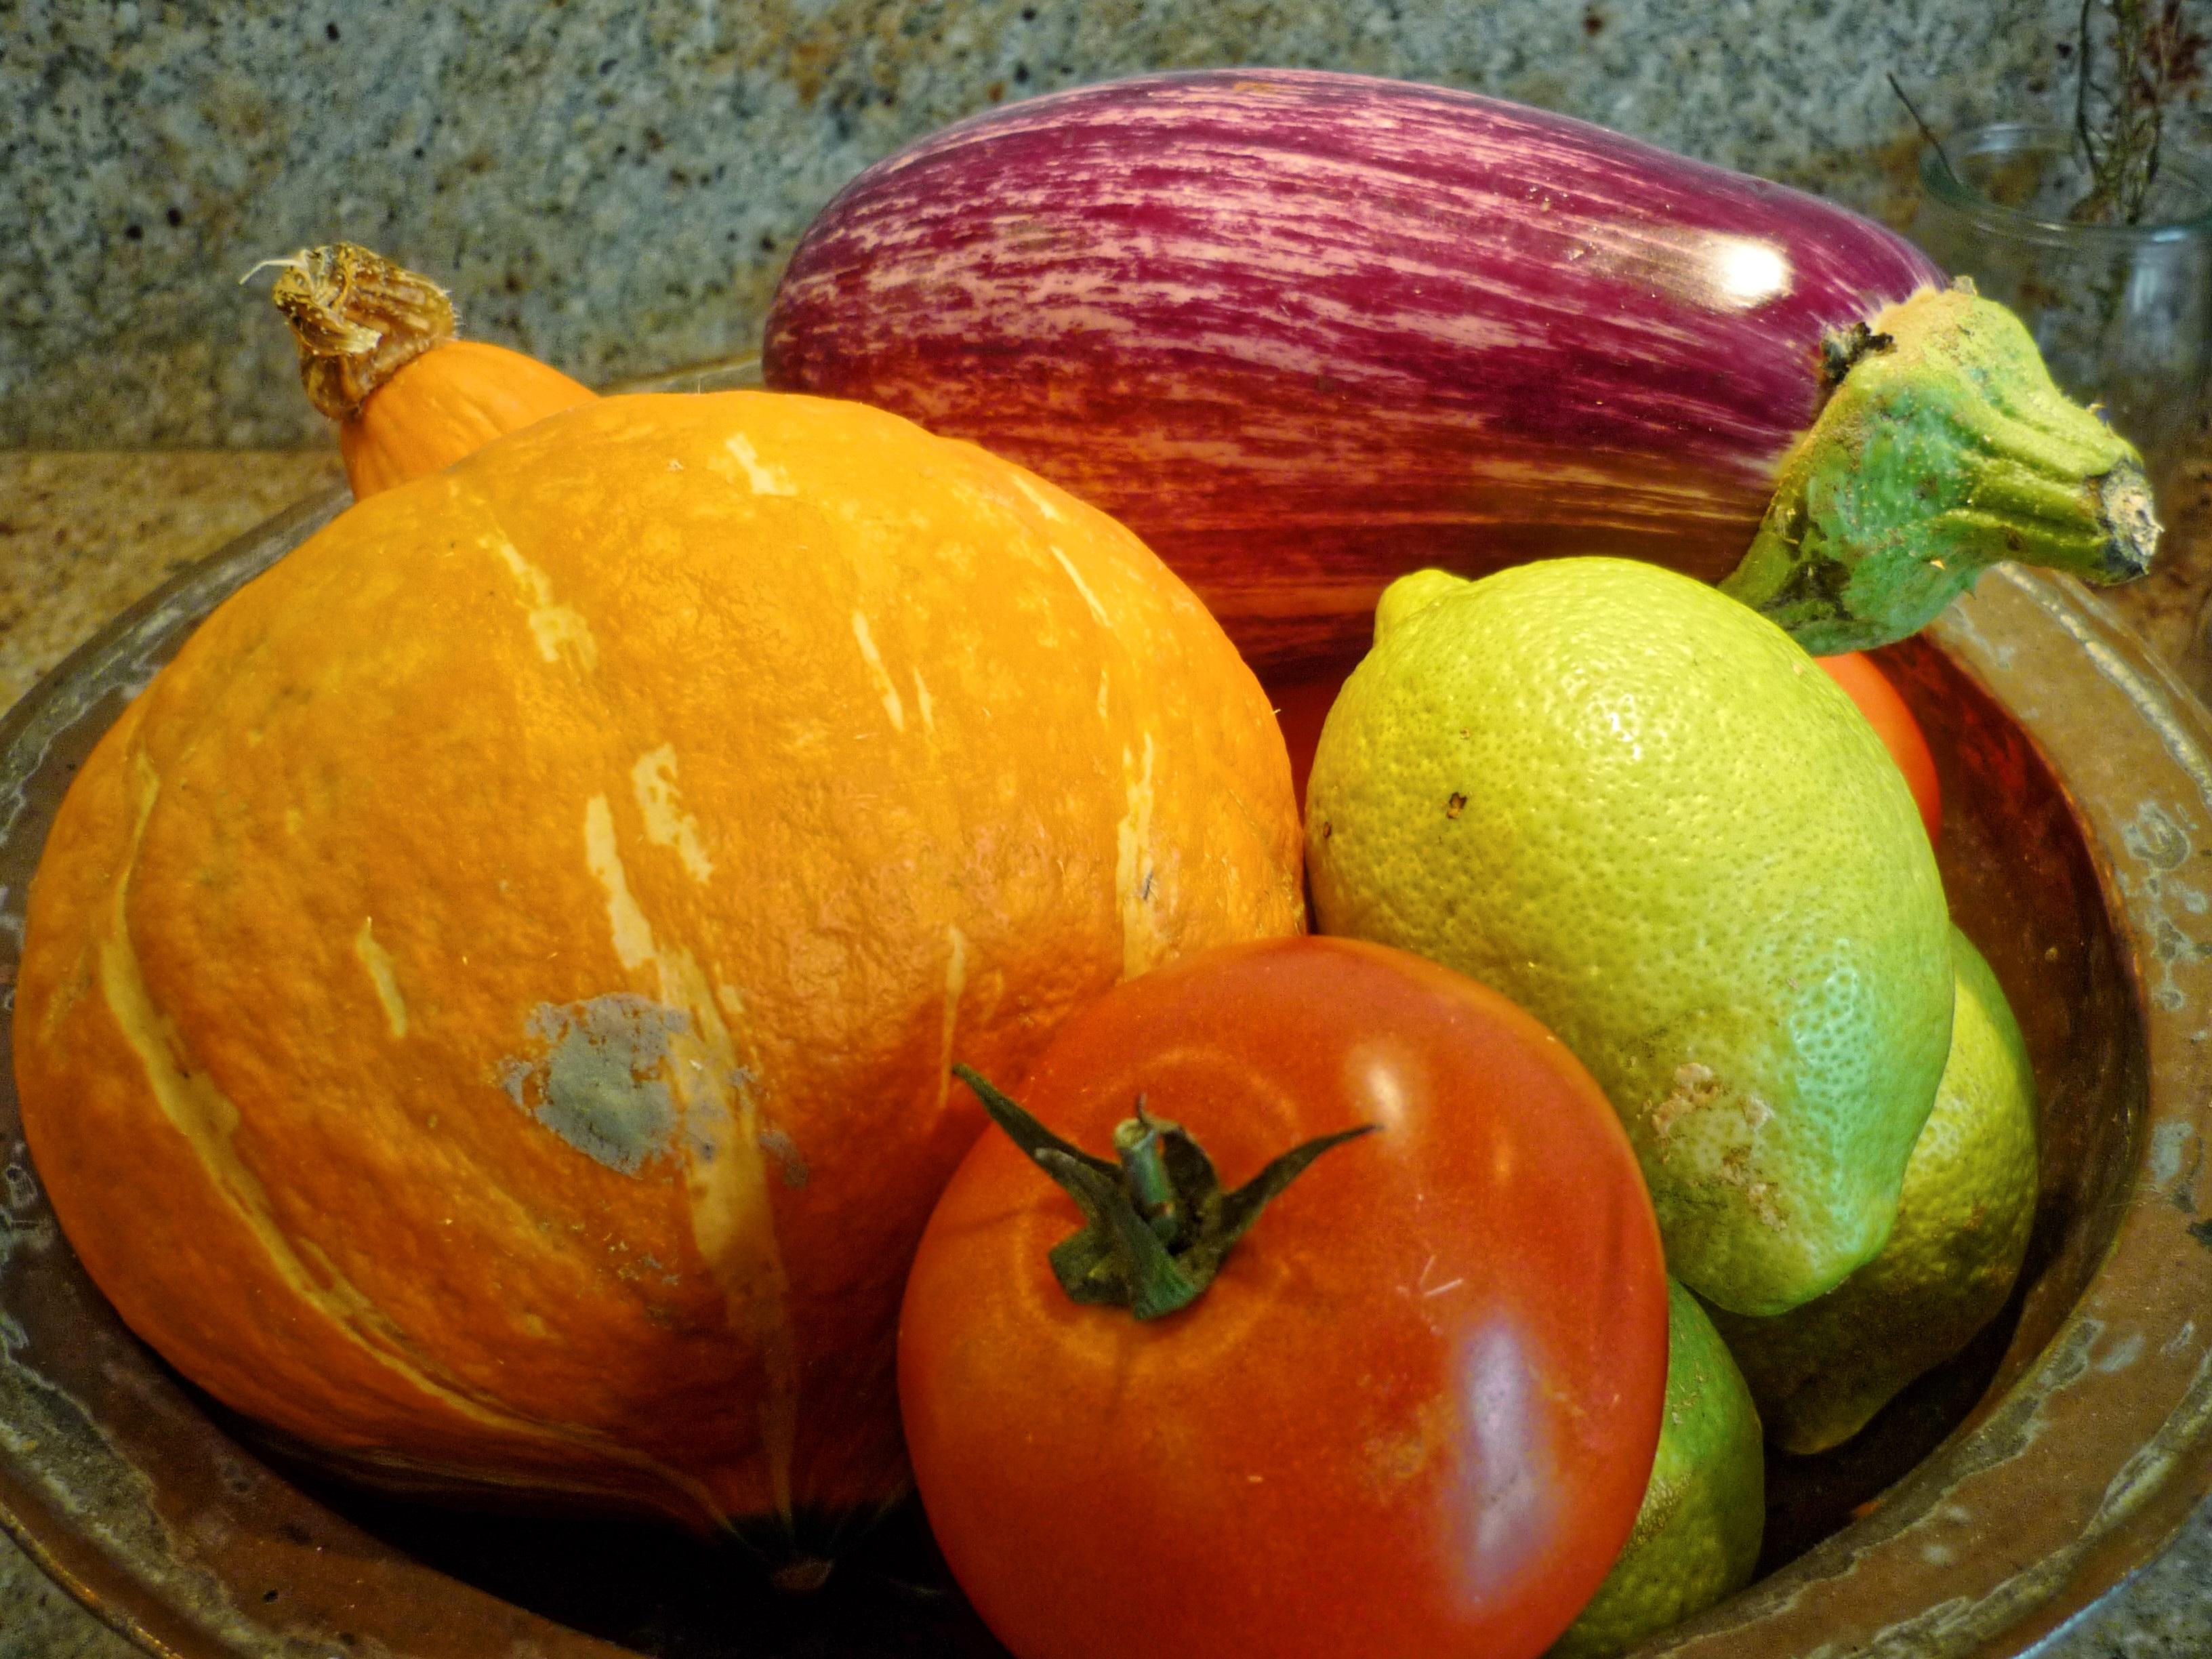 Kostenlose foto : Lebensmittel, produzieren, Gemüse, Kürbis, Malerei ...